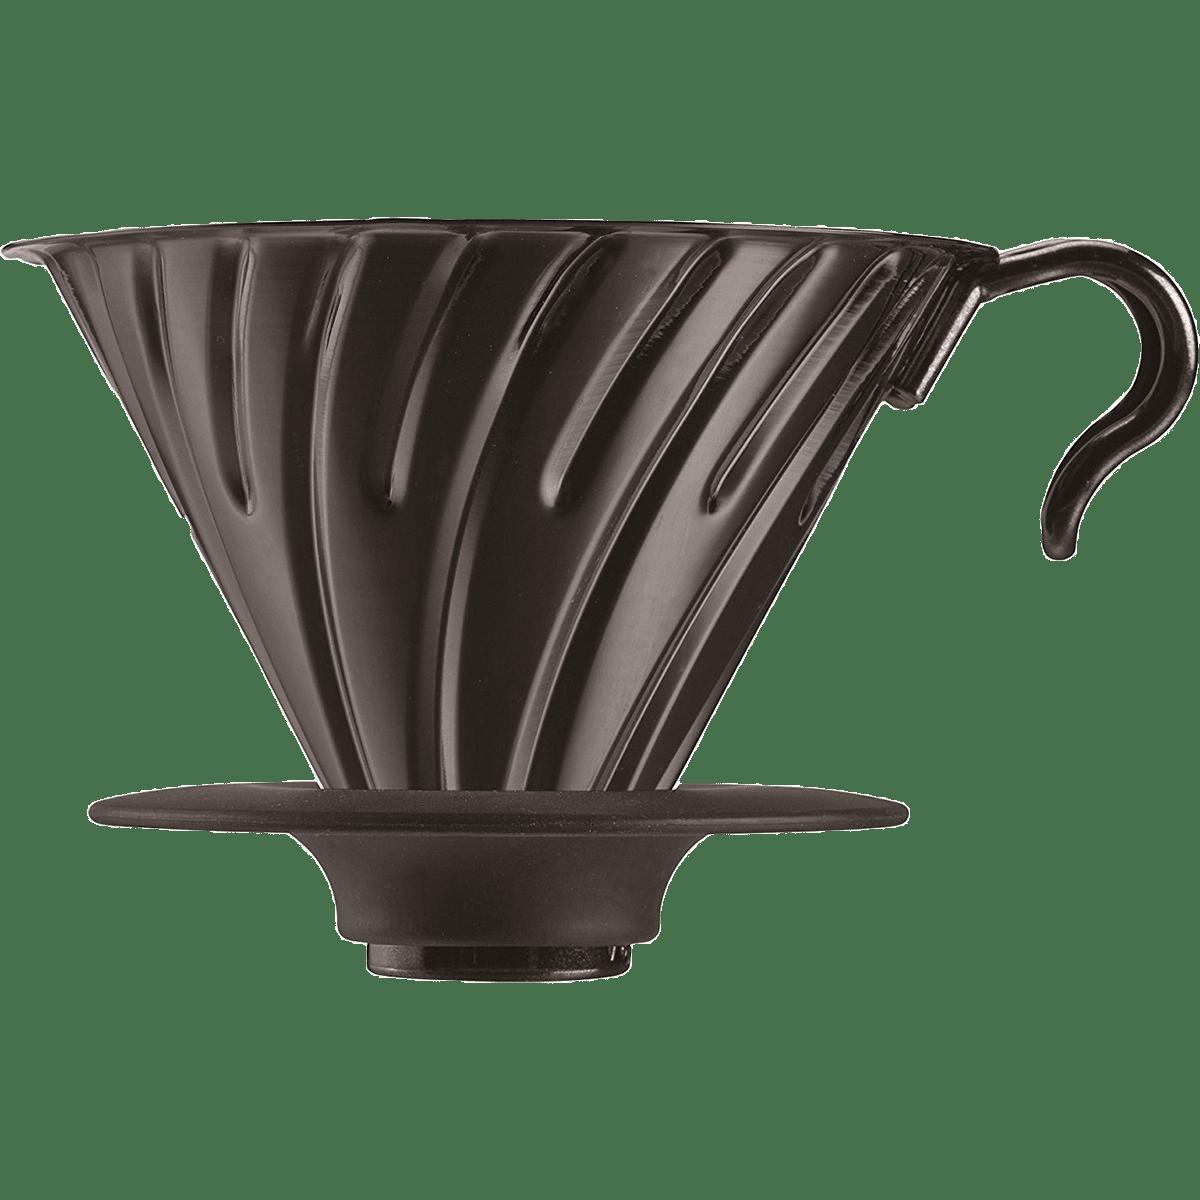 Hario V60 Metal Coffee Dripper Quench Essentials Drip Thermometer Vtm 1b Black